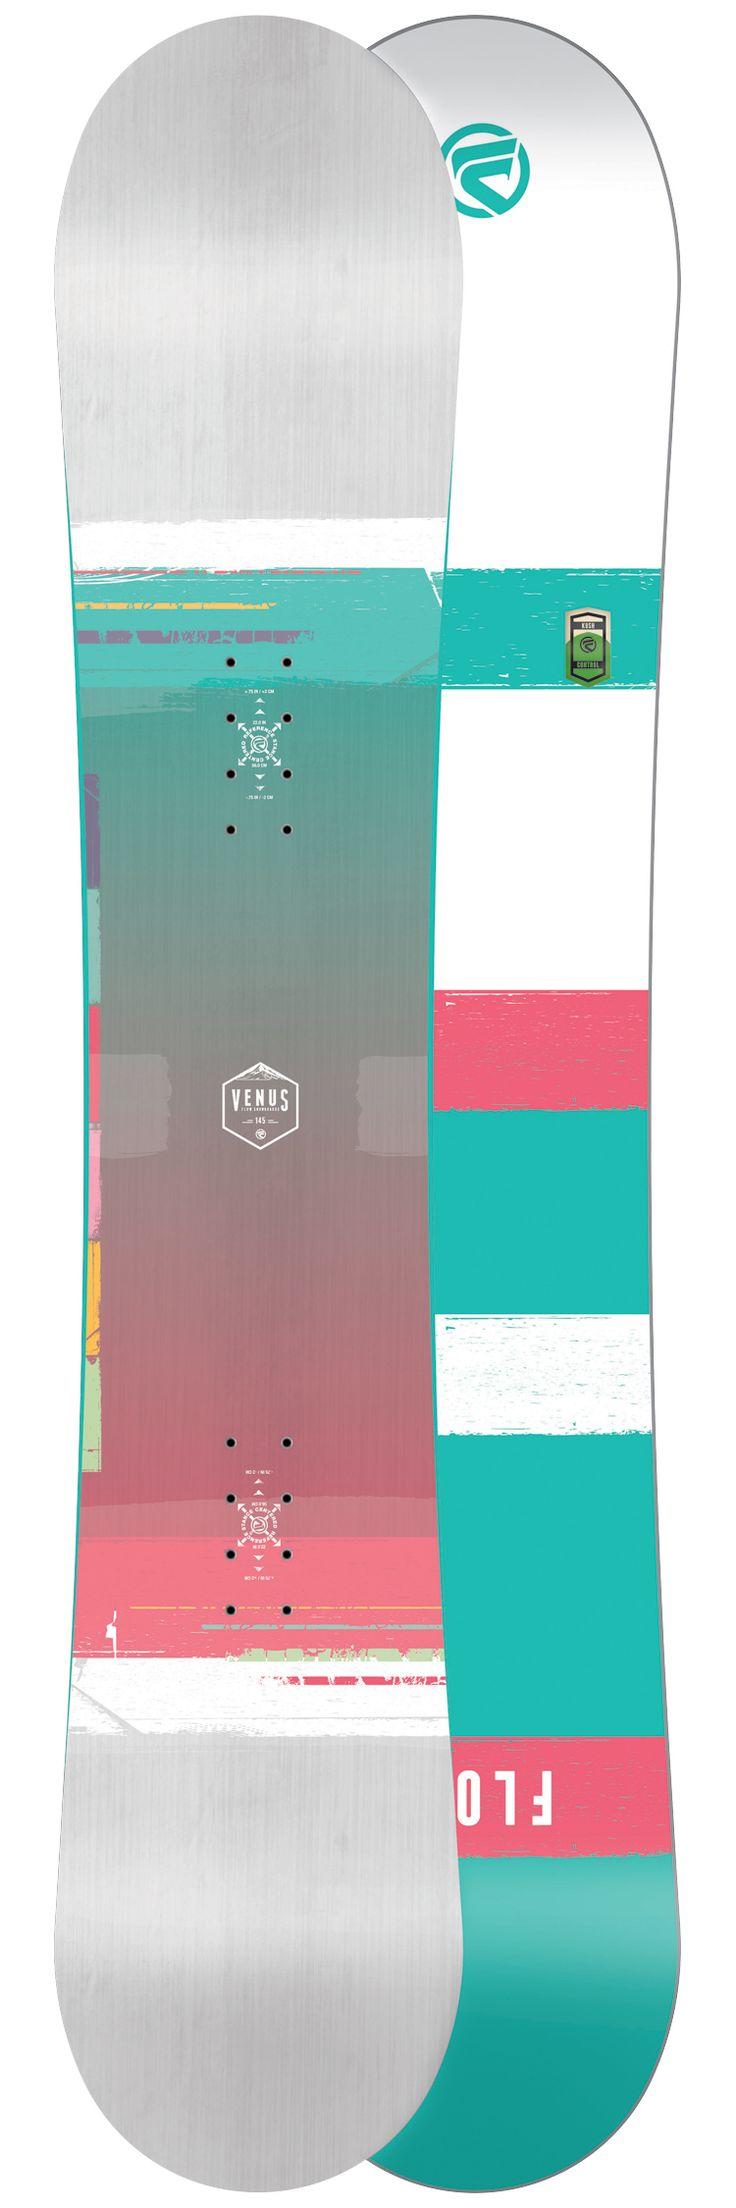 Planche snowboard Flow Venus White Semelle 2017